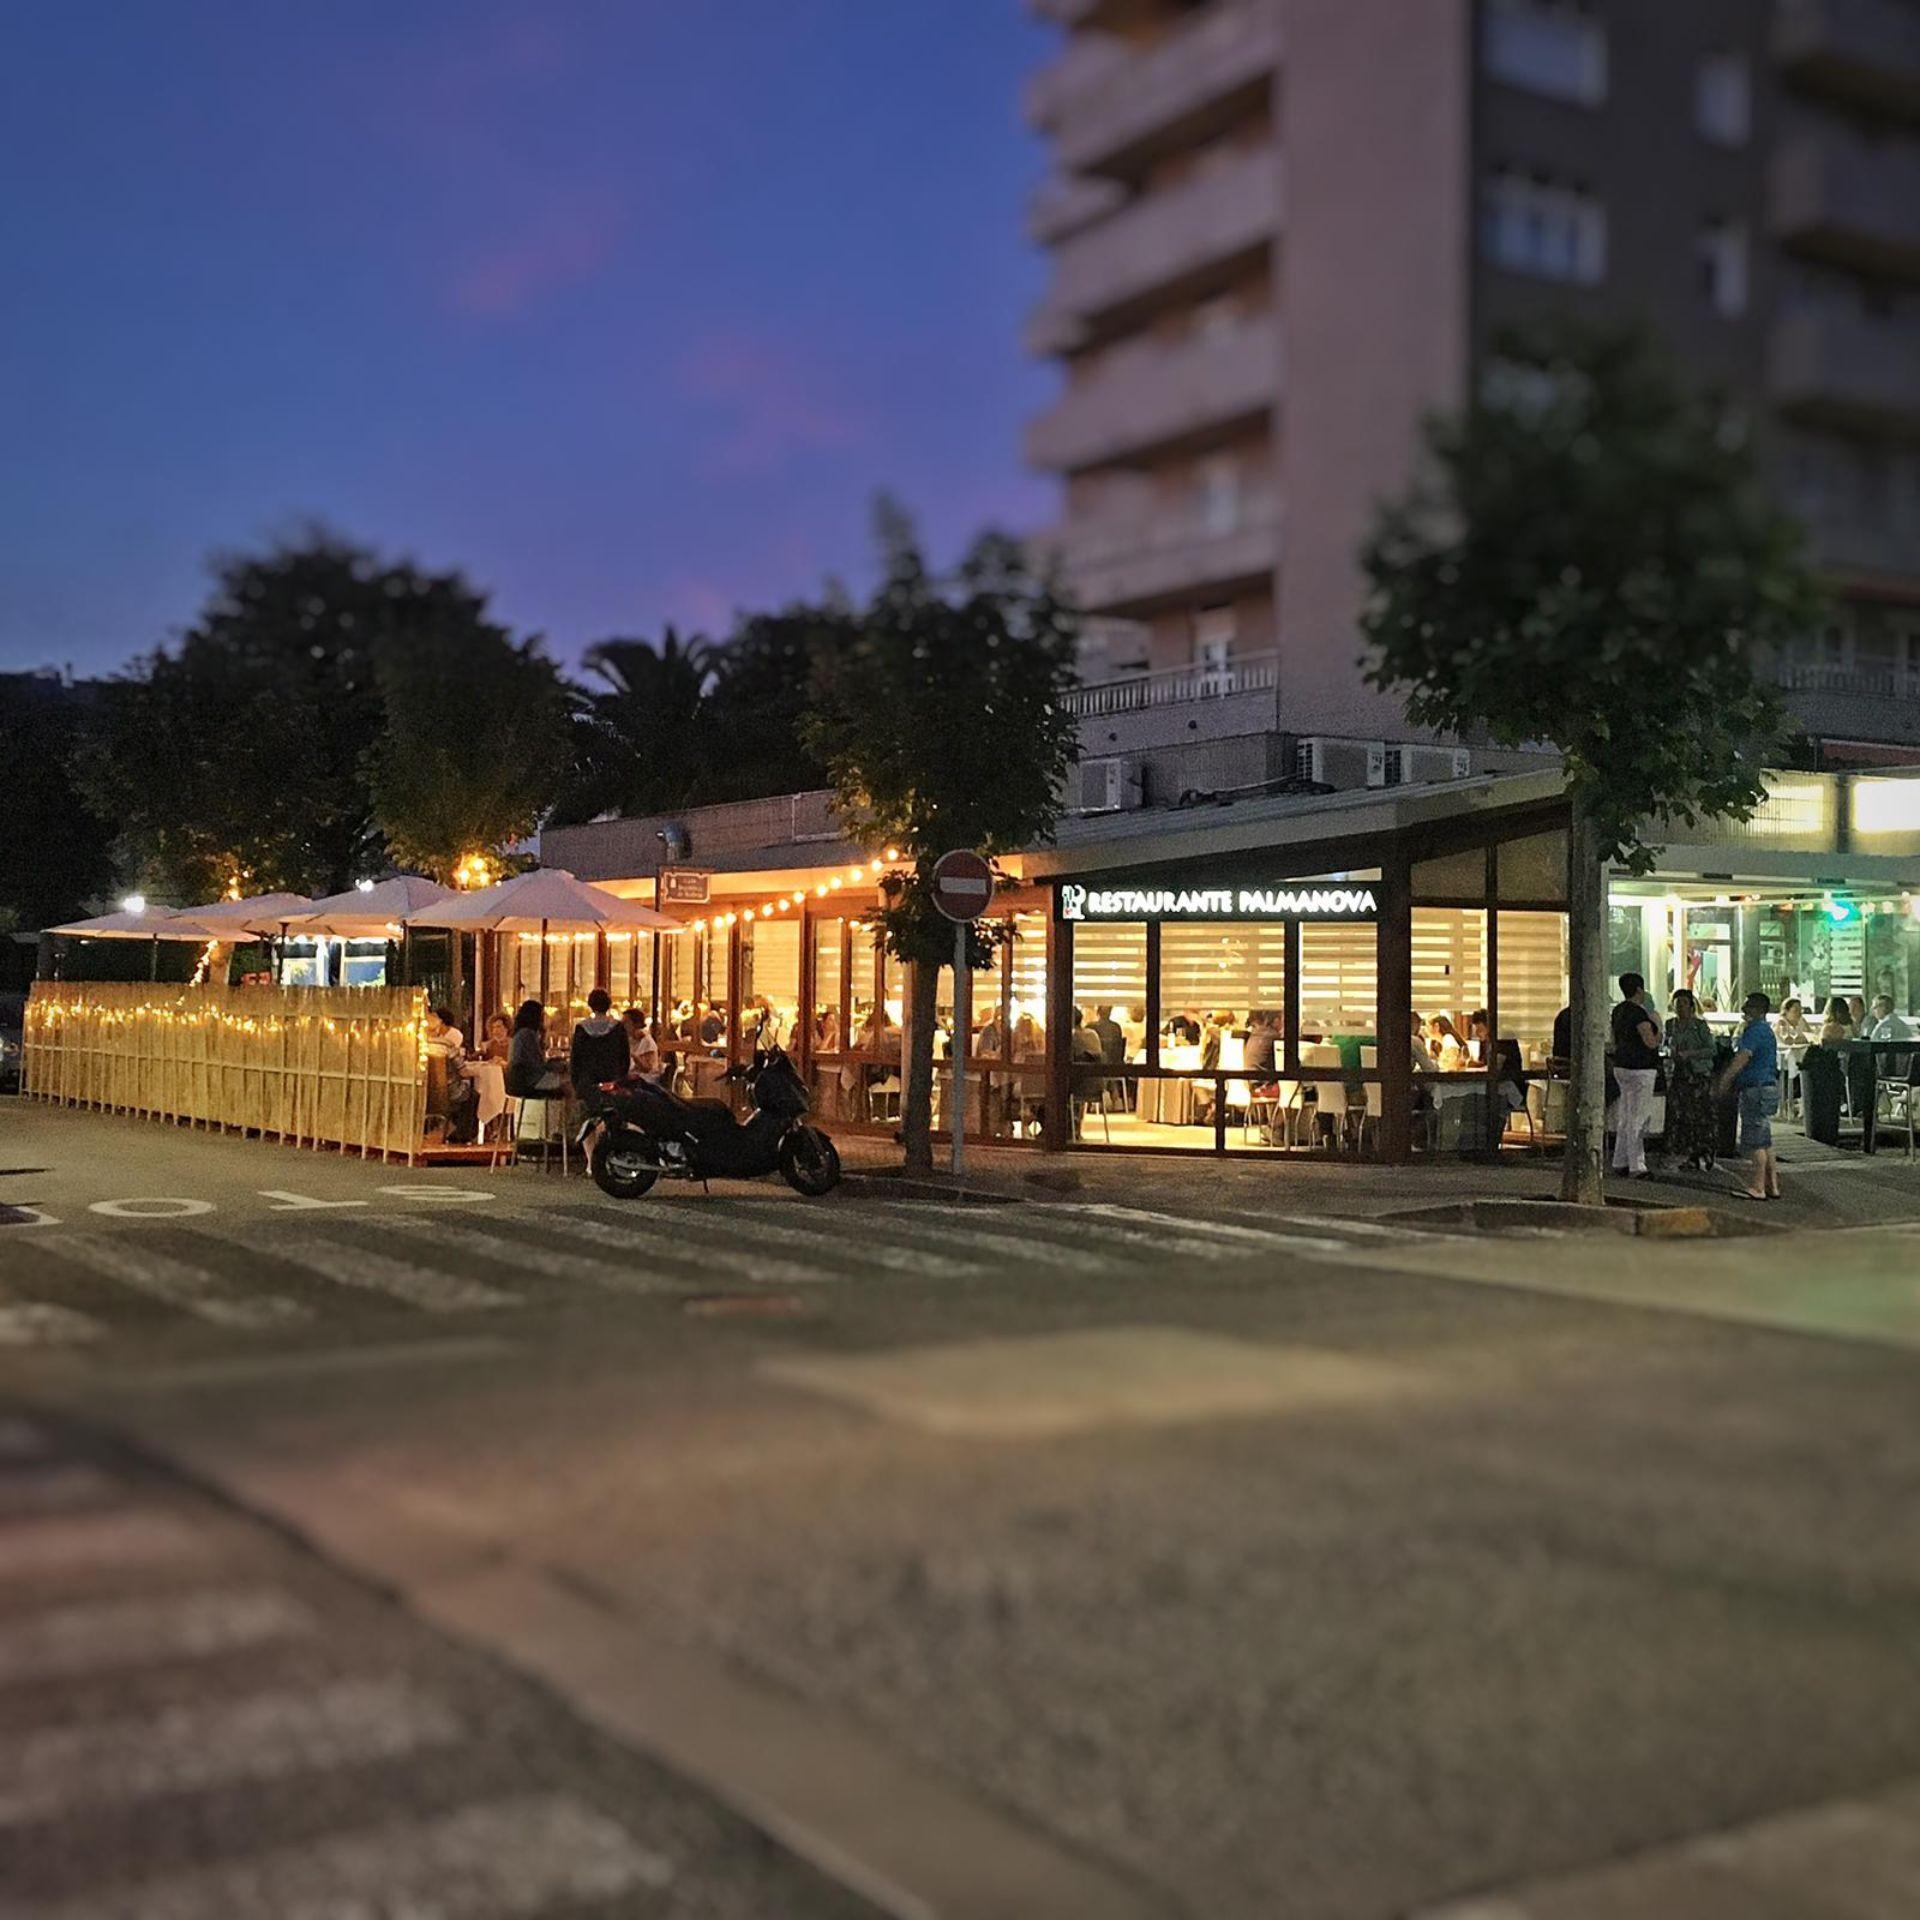 Foto 7 de Restaurantes en Laredo | Restaurante Palmanova